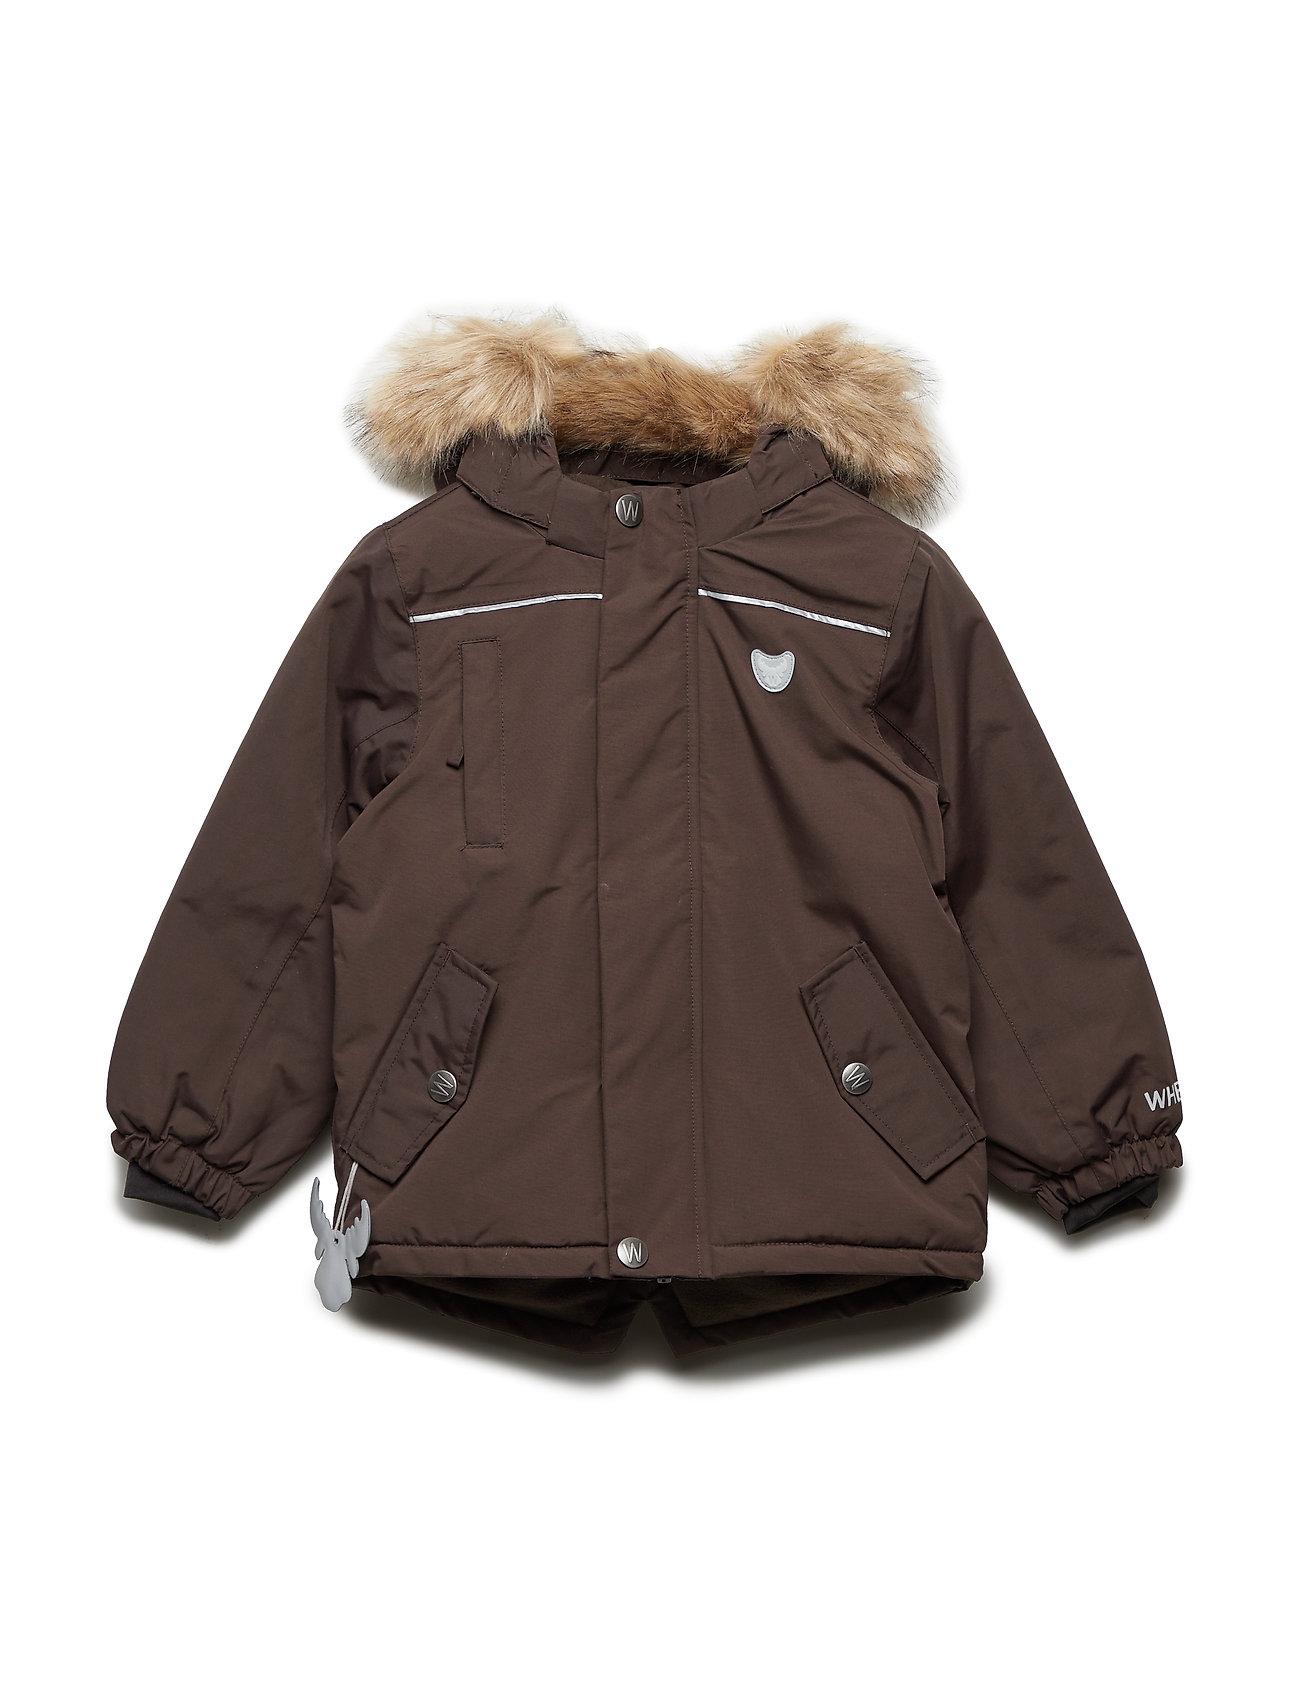 Wheat Jacket Vilmar